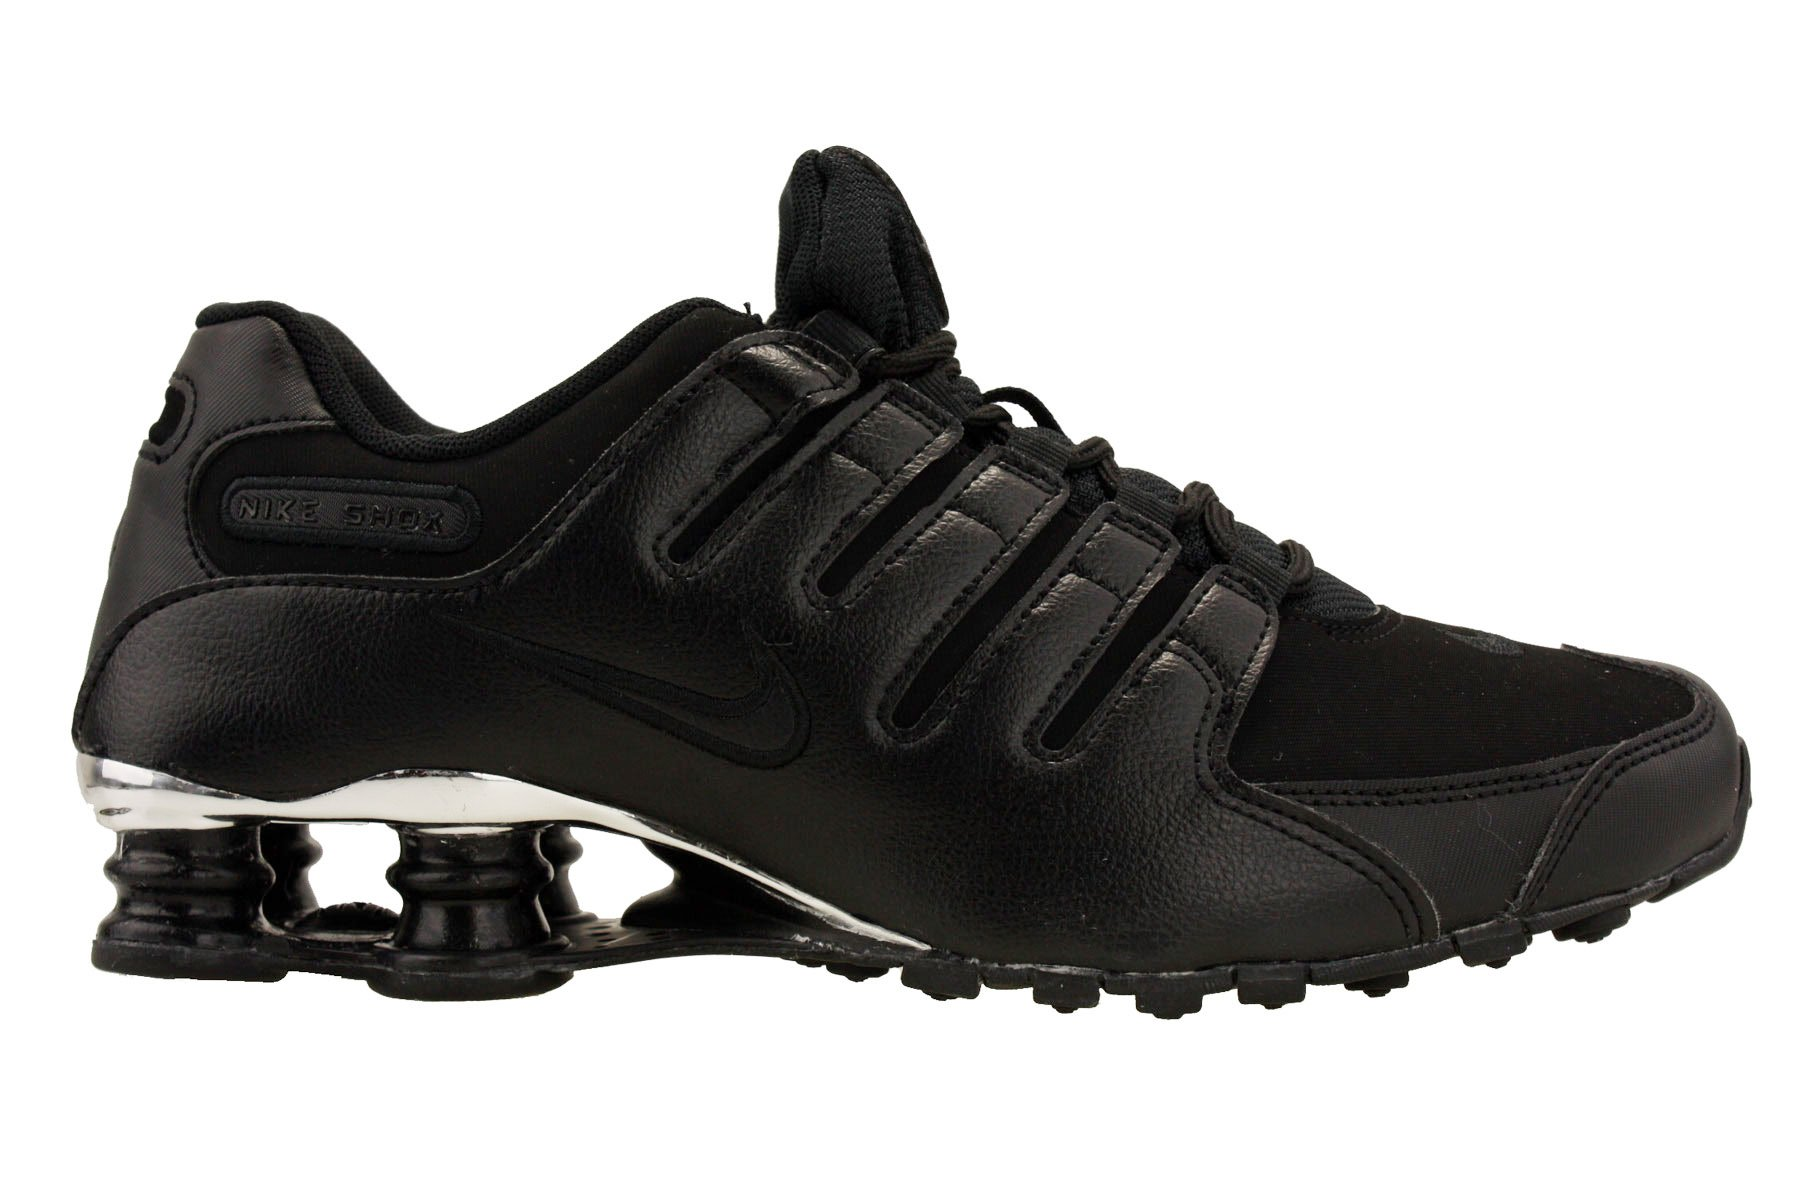 5e5fb7e7ca5 Galleon - Nike Mens Shox NZ Premium Running Shoes Black Chrome 536184-001  Size 10